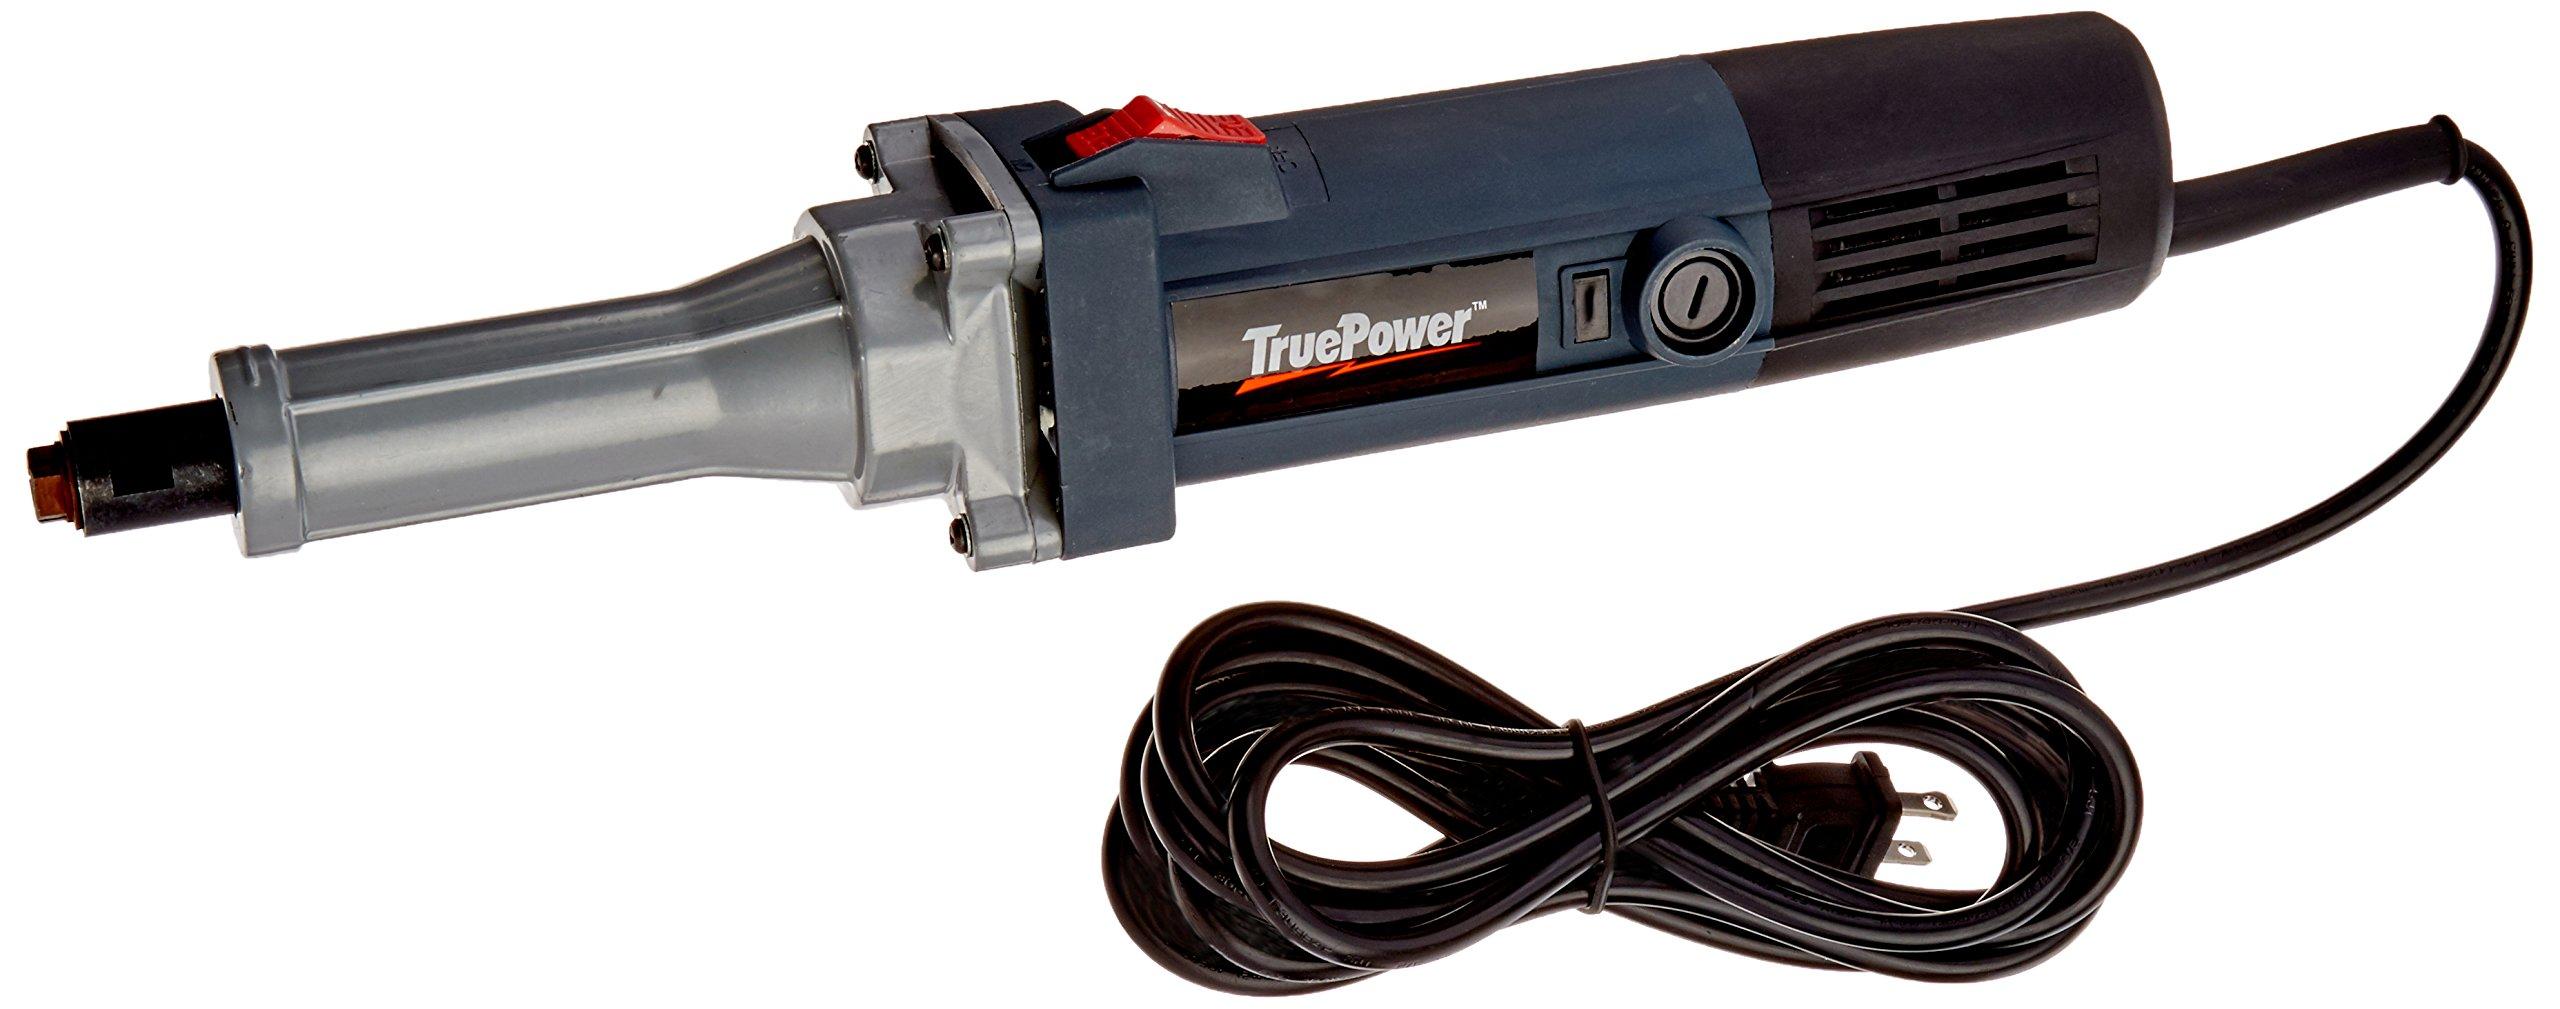 Gino Development 01-0698 TruePower Heavy Duty Long Shaft Electric Die Grinder